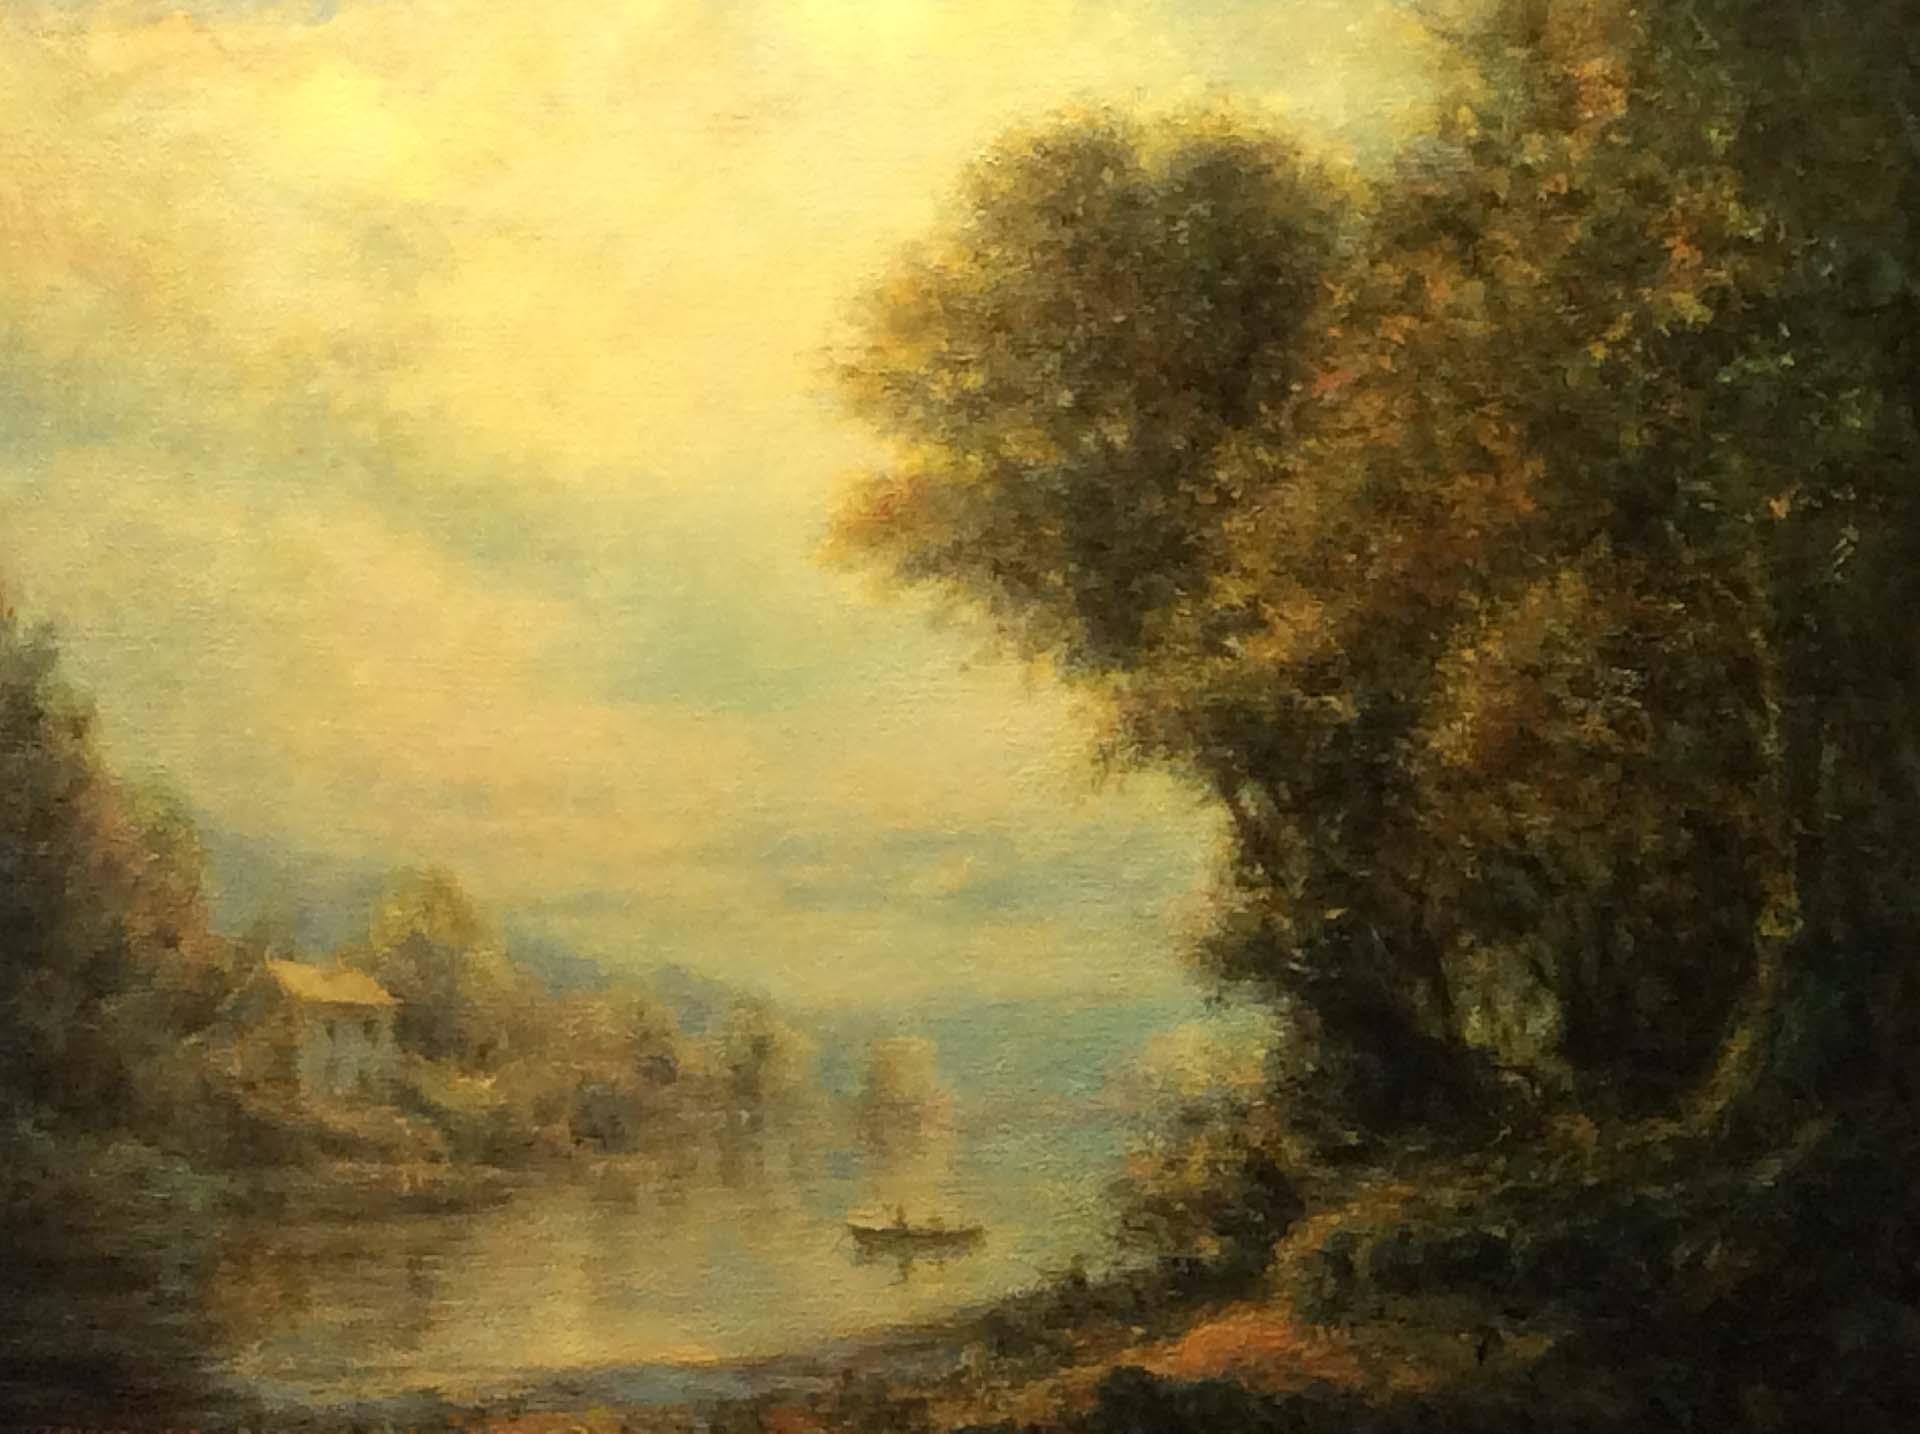 Leland John, Yamhill River